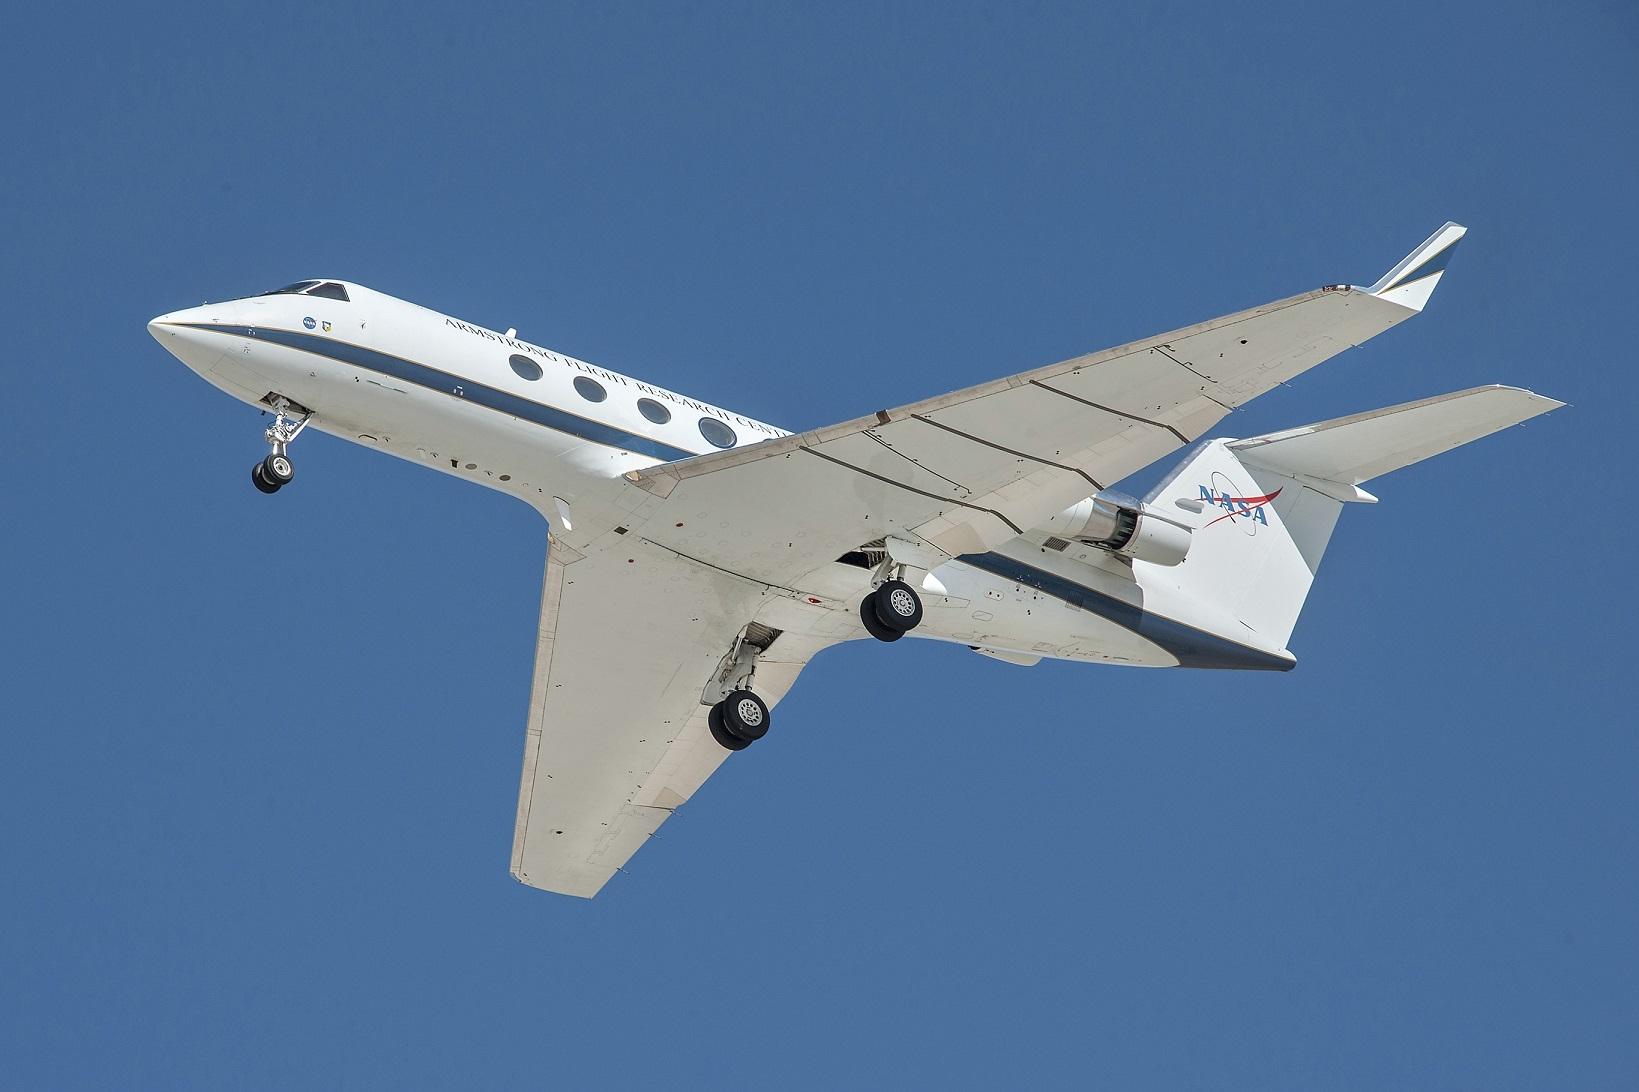 NASA's aircraft modifications make planes 70 percent quieter | DeviceDaily.com